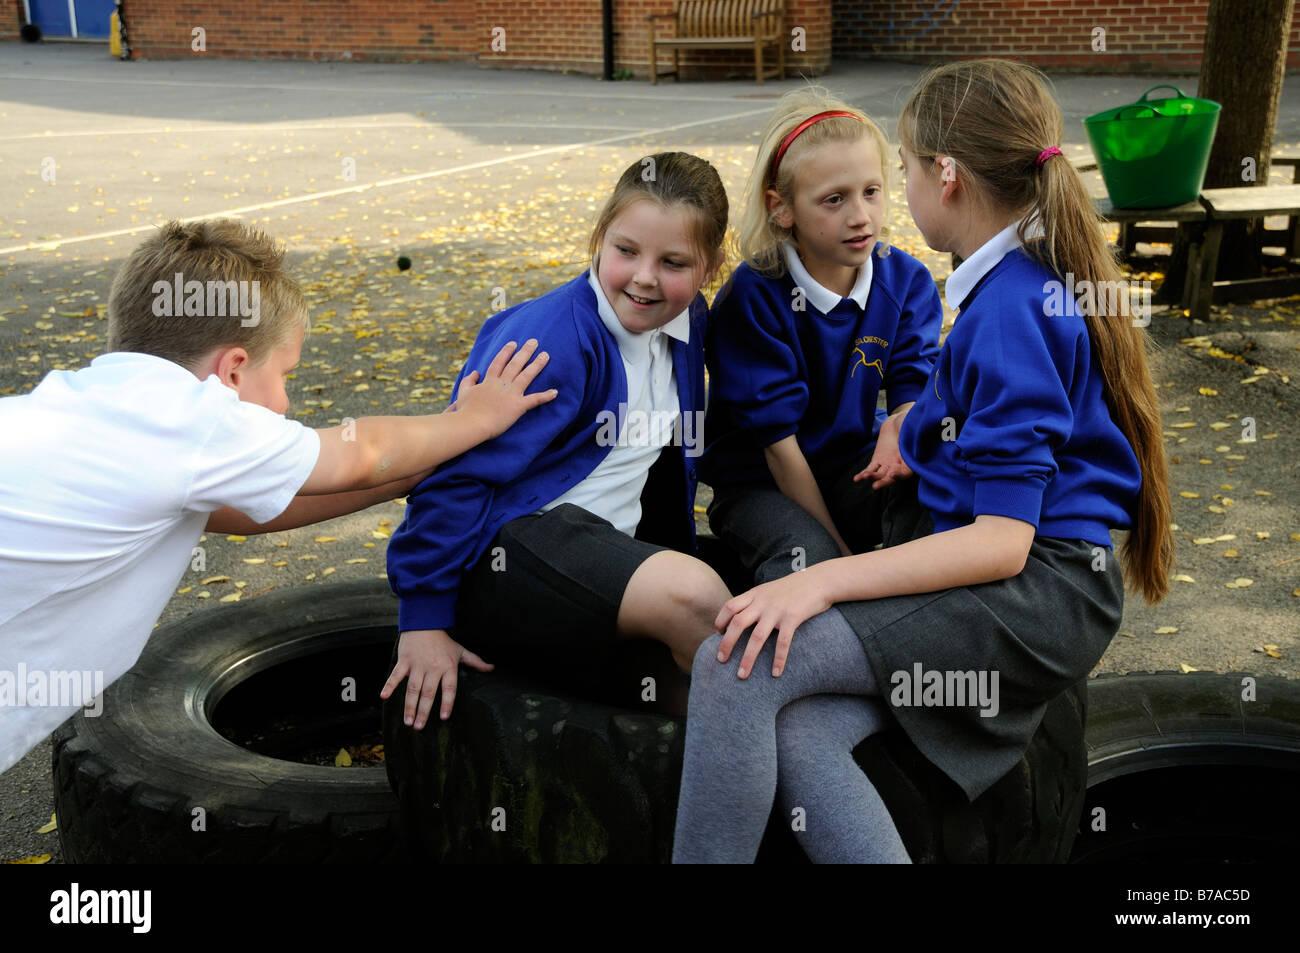 School bullying - Wikipedia